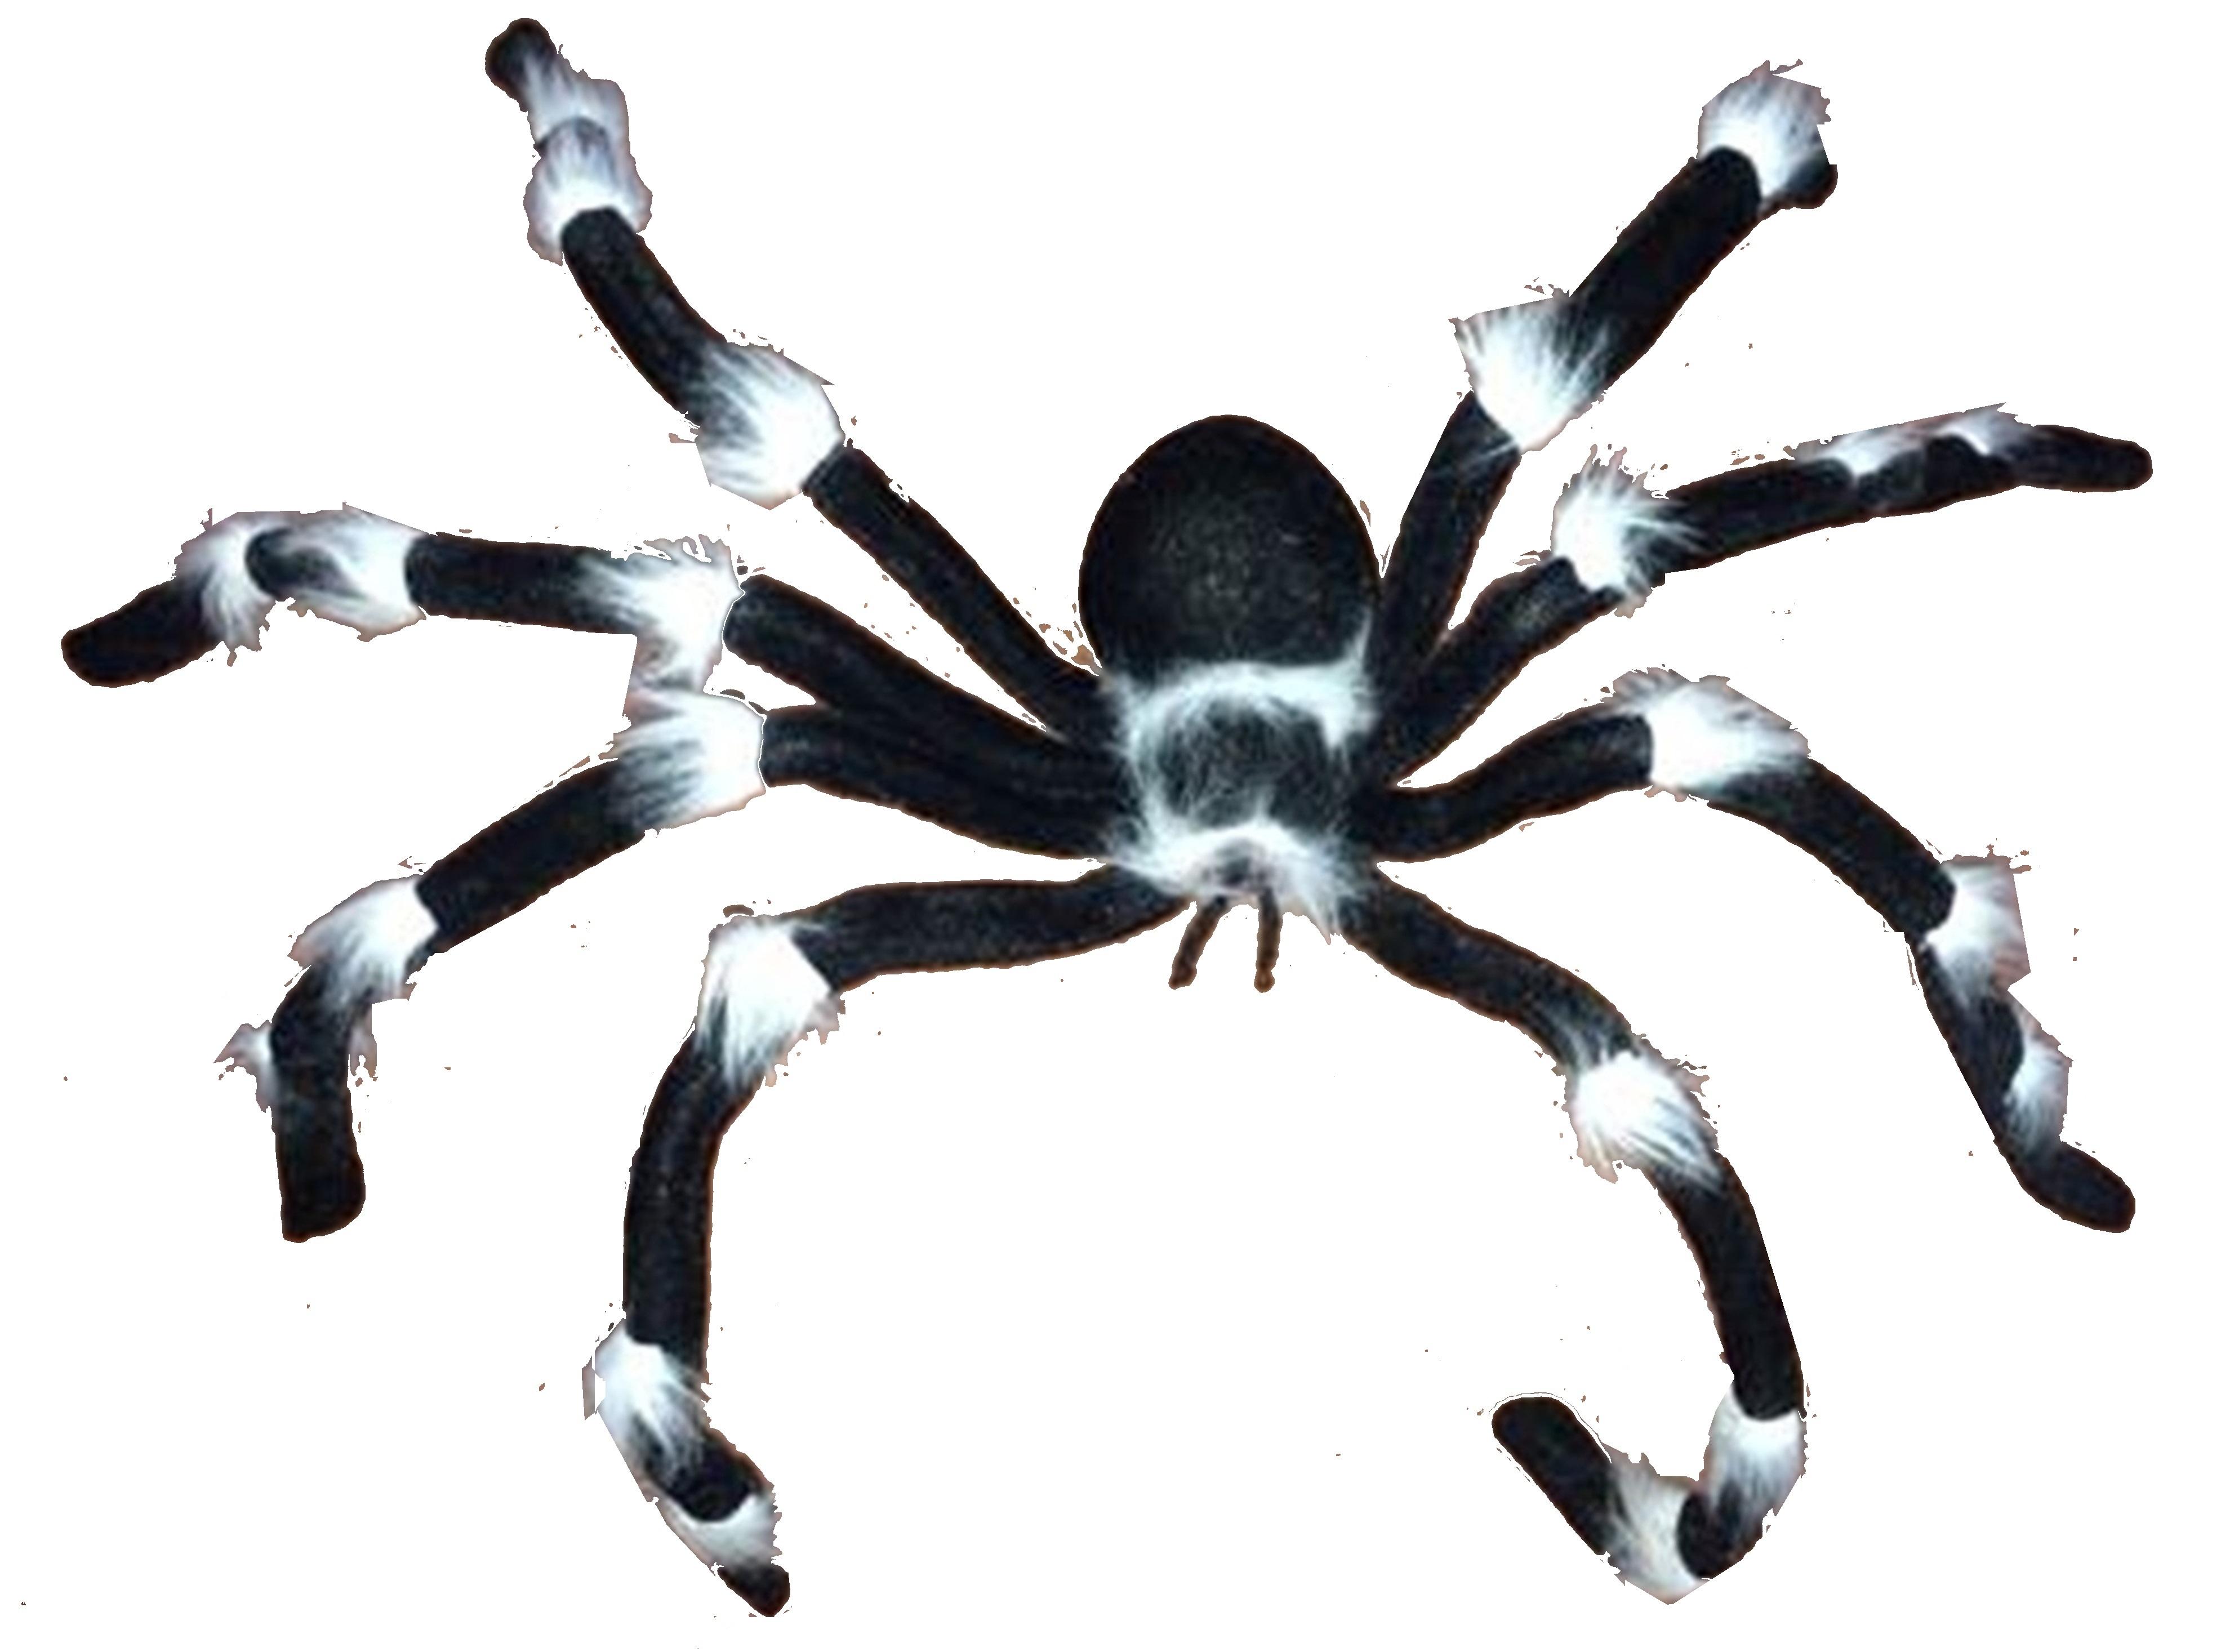 Black&white spider